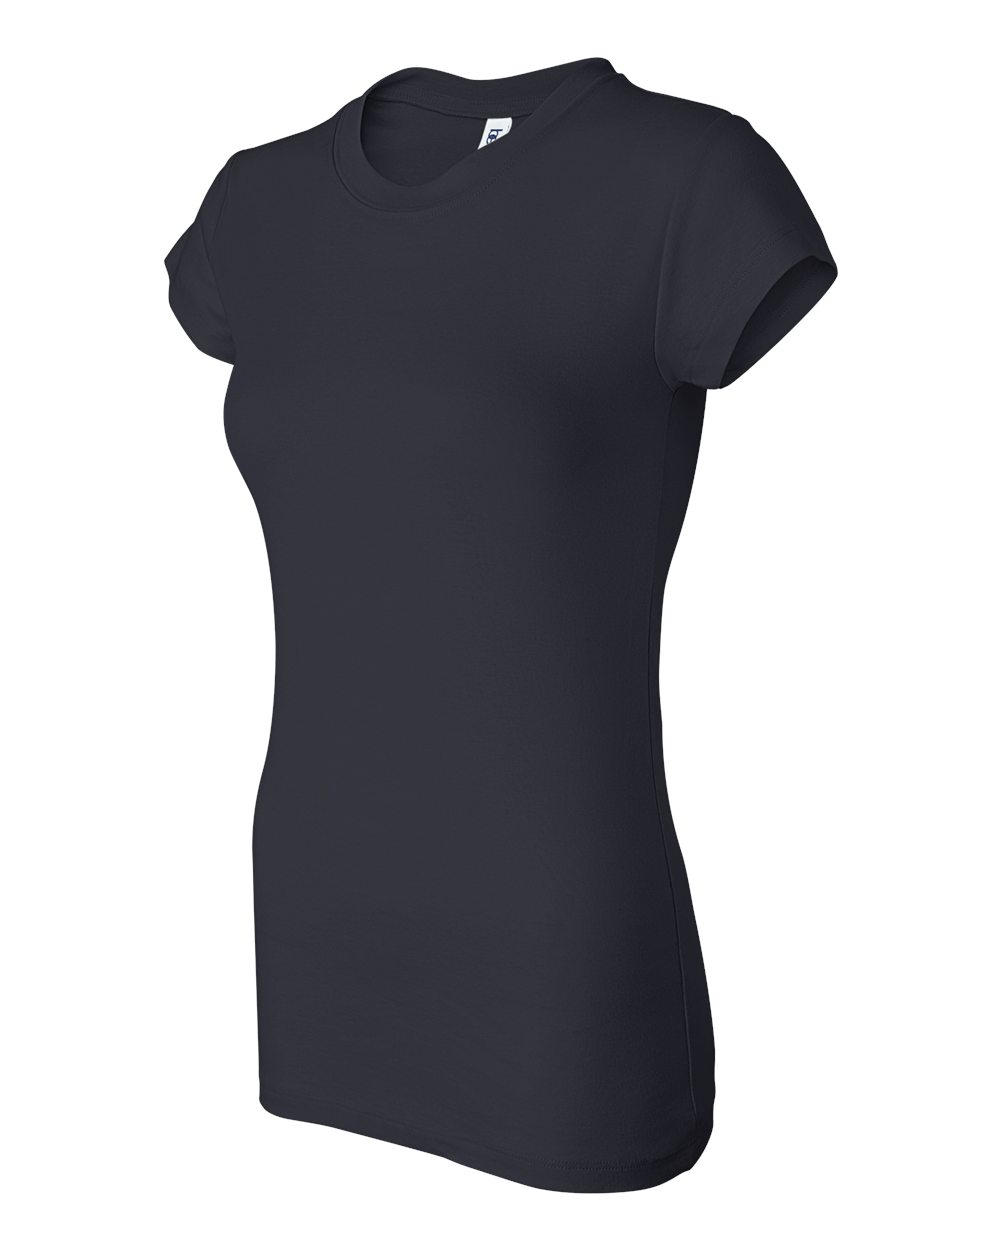 Bella-Canvas-Women-039-s-Sheer-Mini-Rib-Short-Sleeve-T-Shirt-8701-S-2XL thumbnail 21